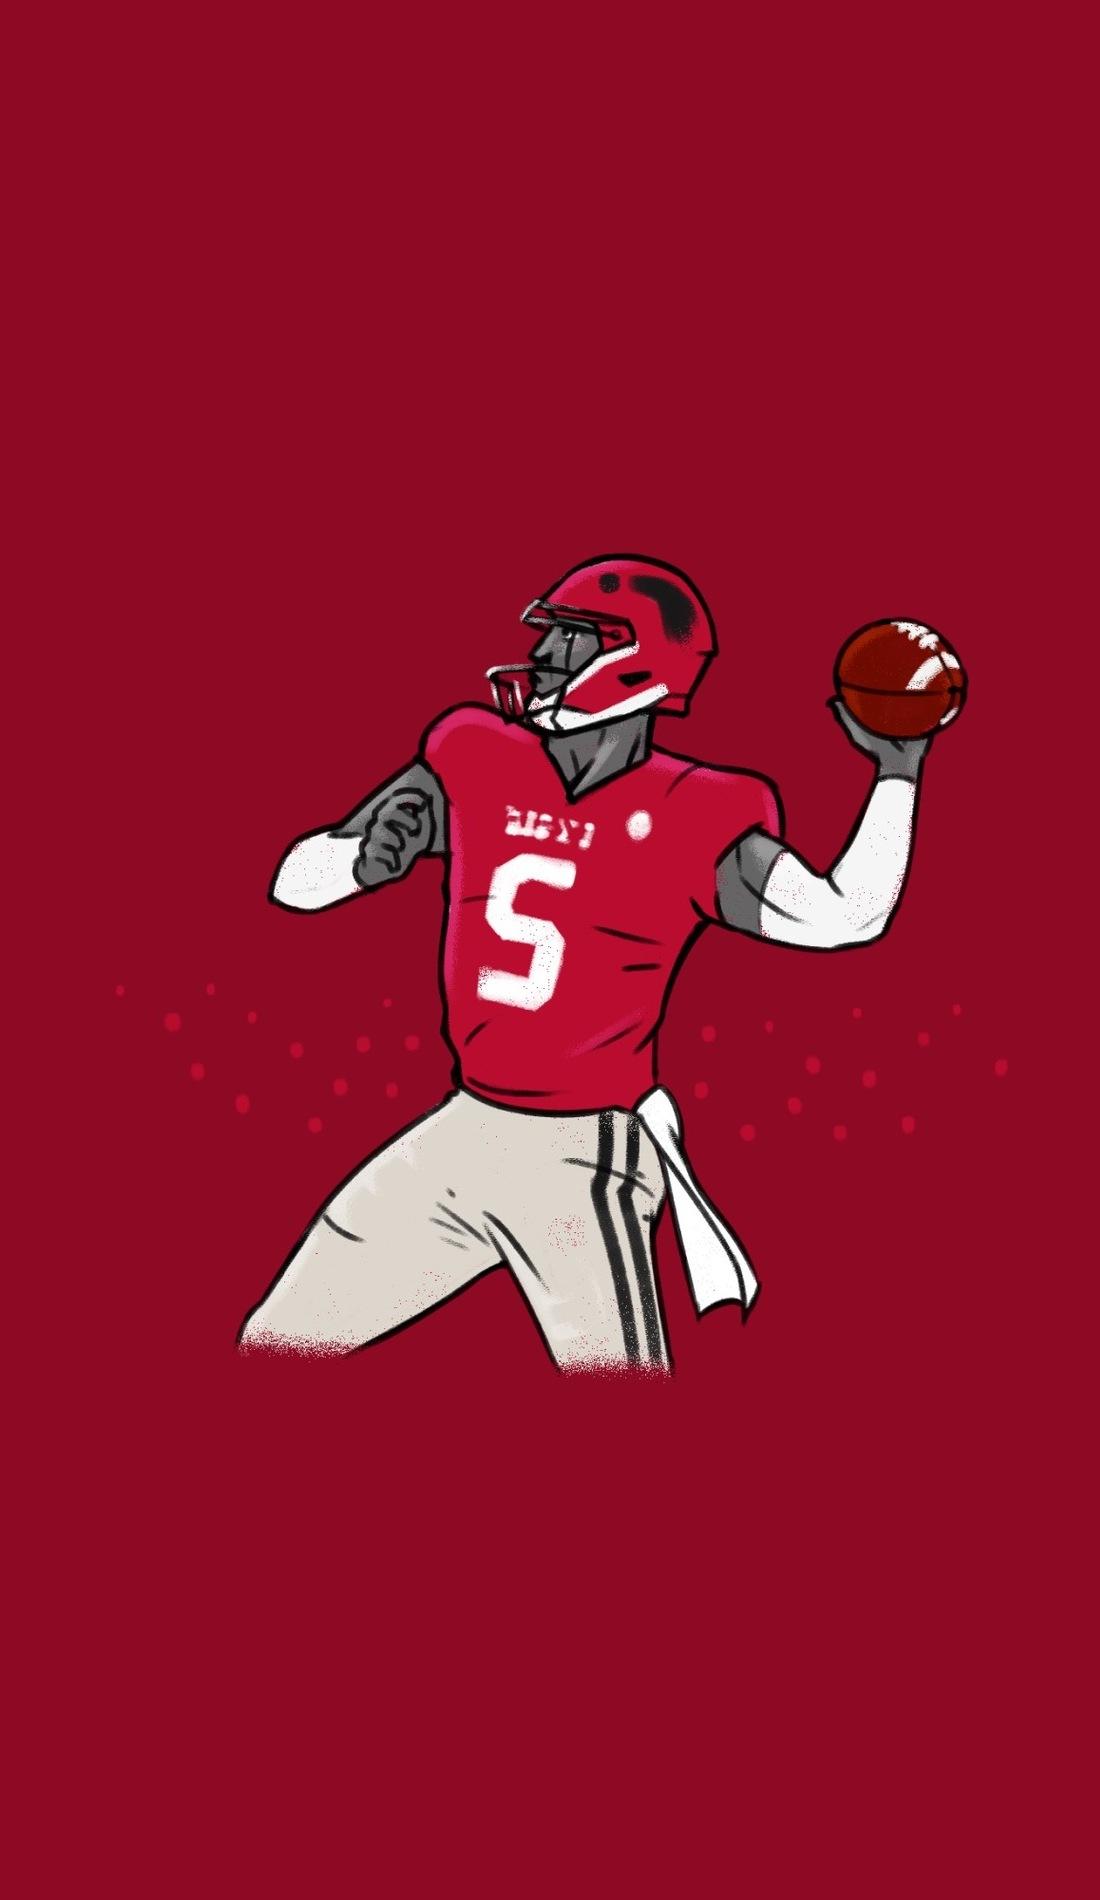 A Georgia Bulldogs Football live event